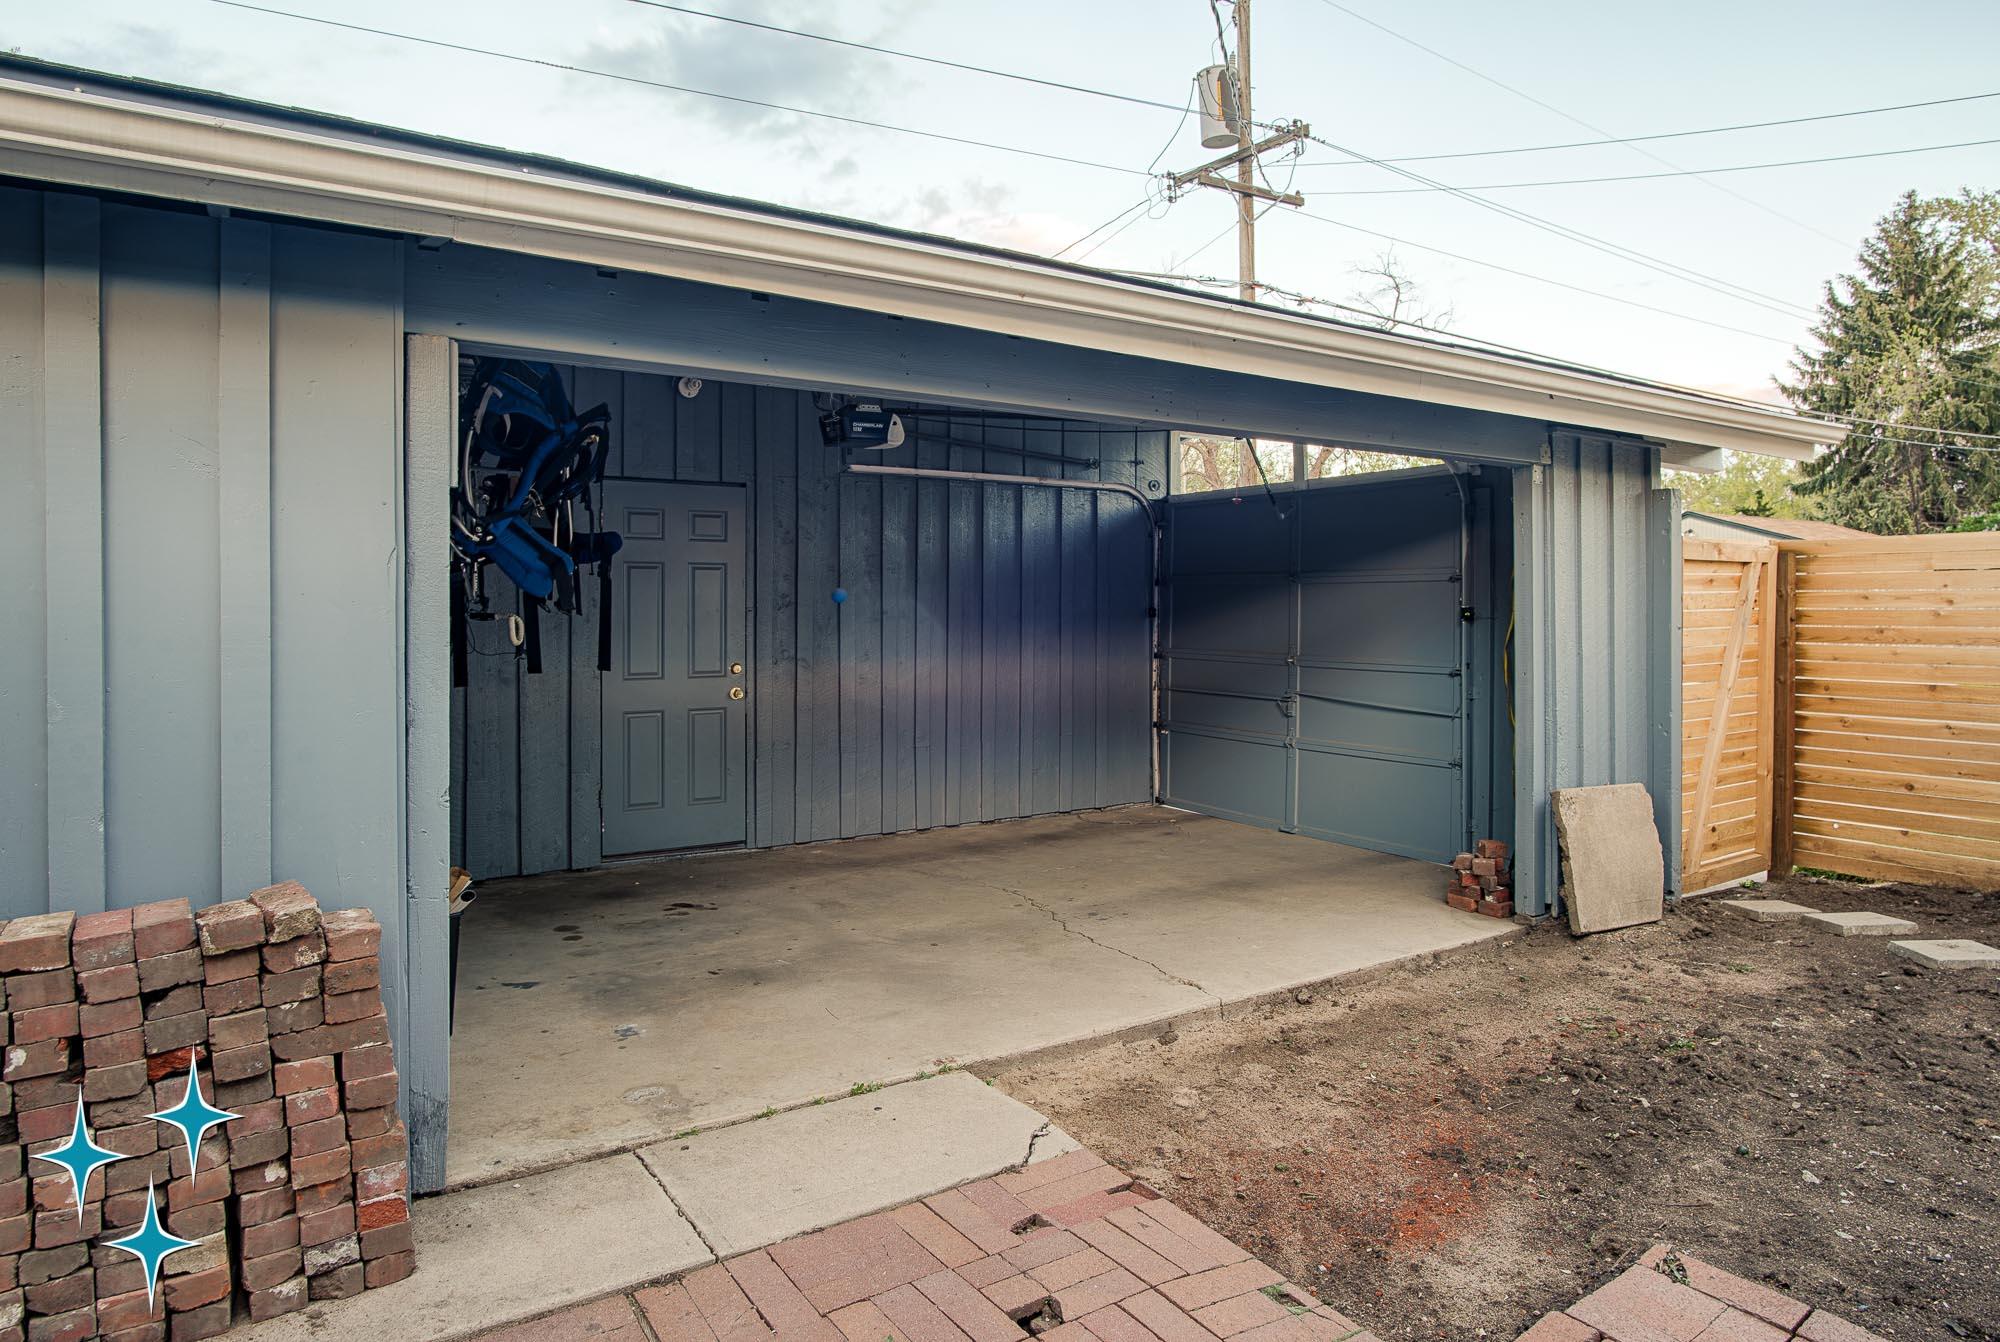 Adrian-Kinney-2596-S-Osceola-Street-Denver-Cliff-May-Harvey-Park-2000w50-3SWM-32.jpg